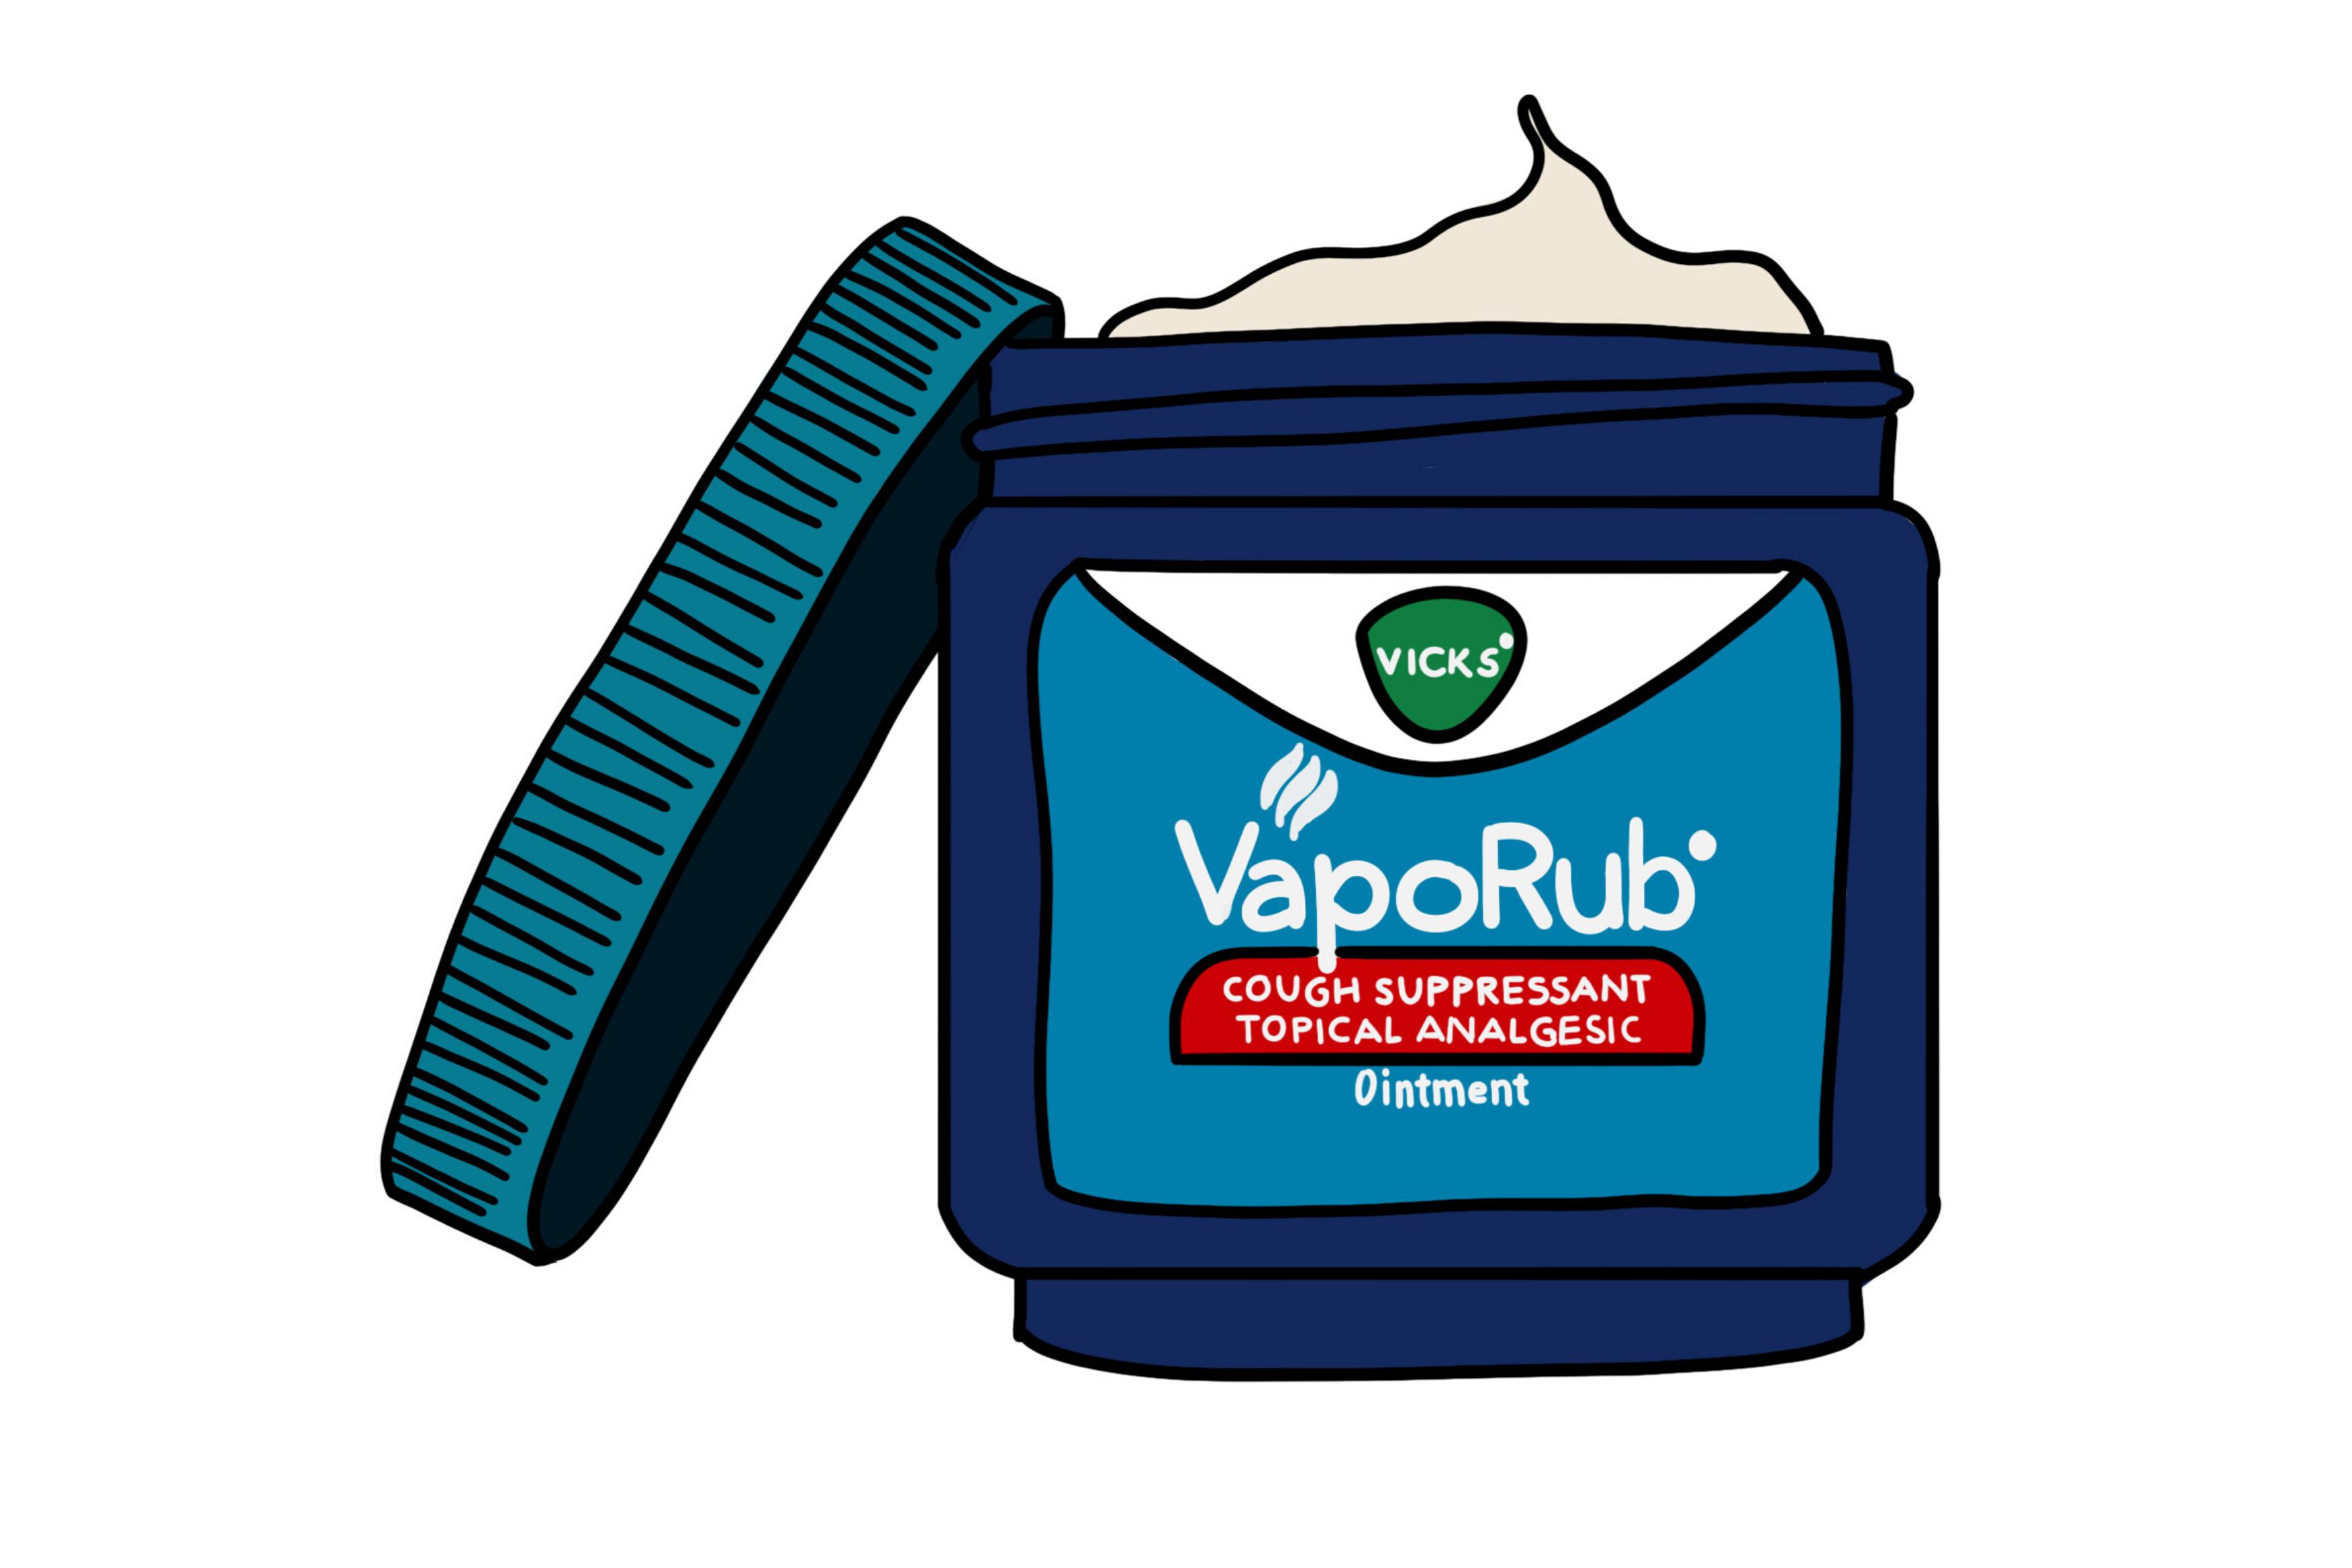 Vicks VapoRub Review: Does Vicks VapoRub Really Work?